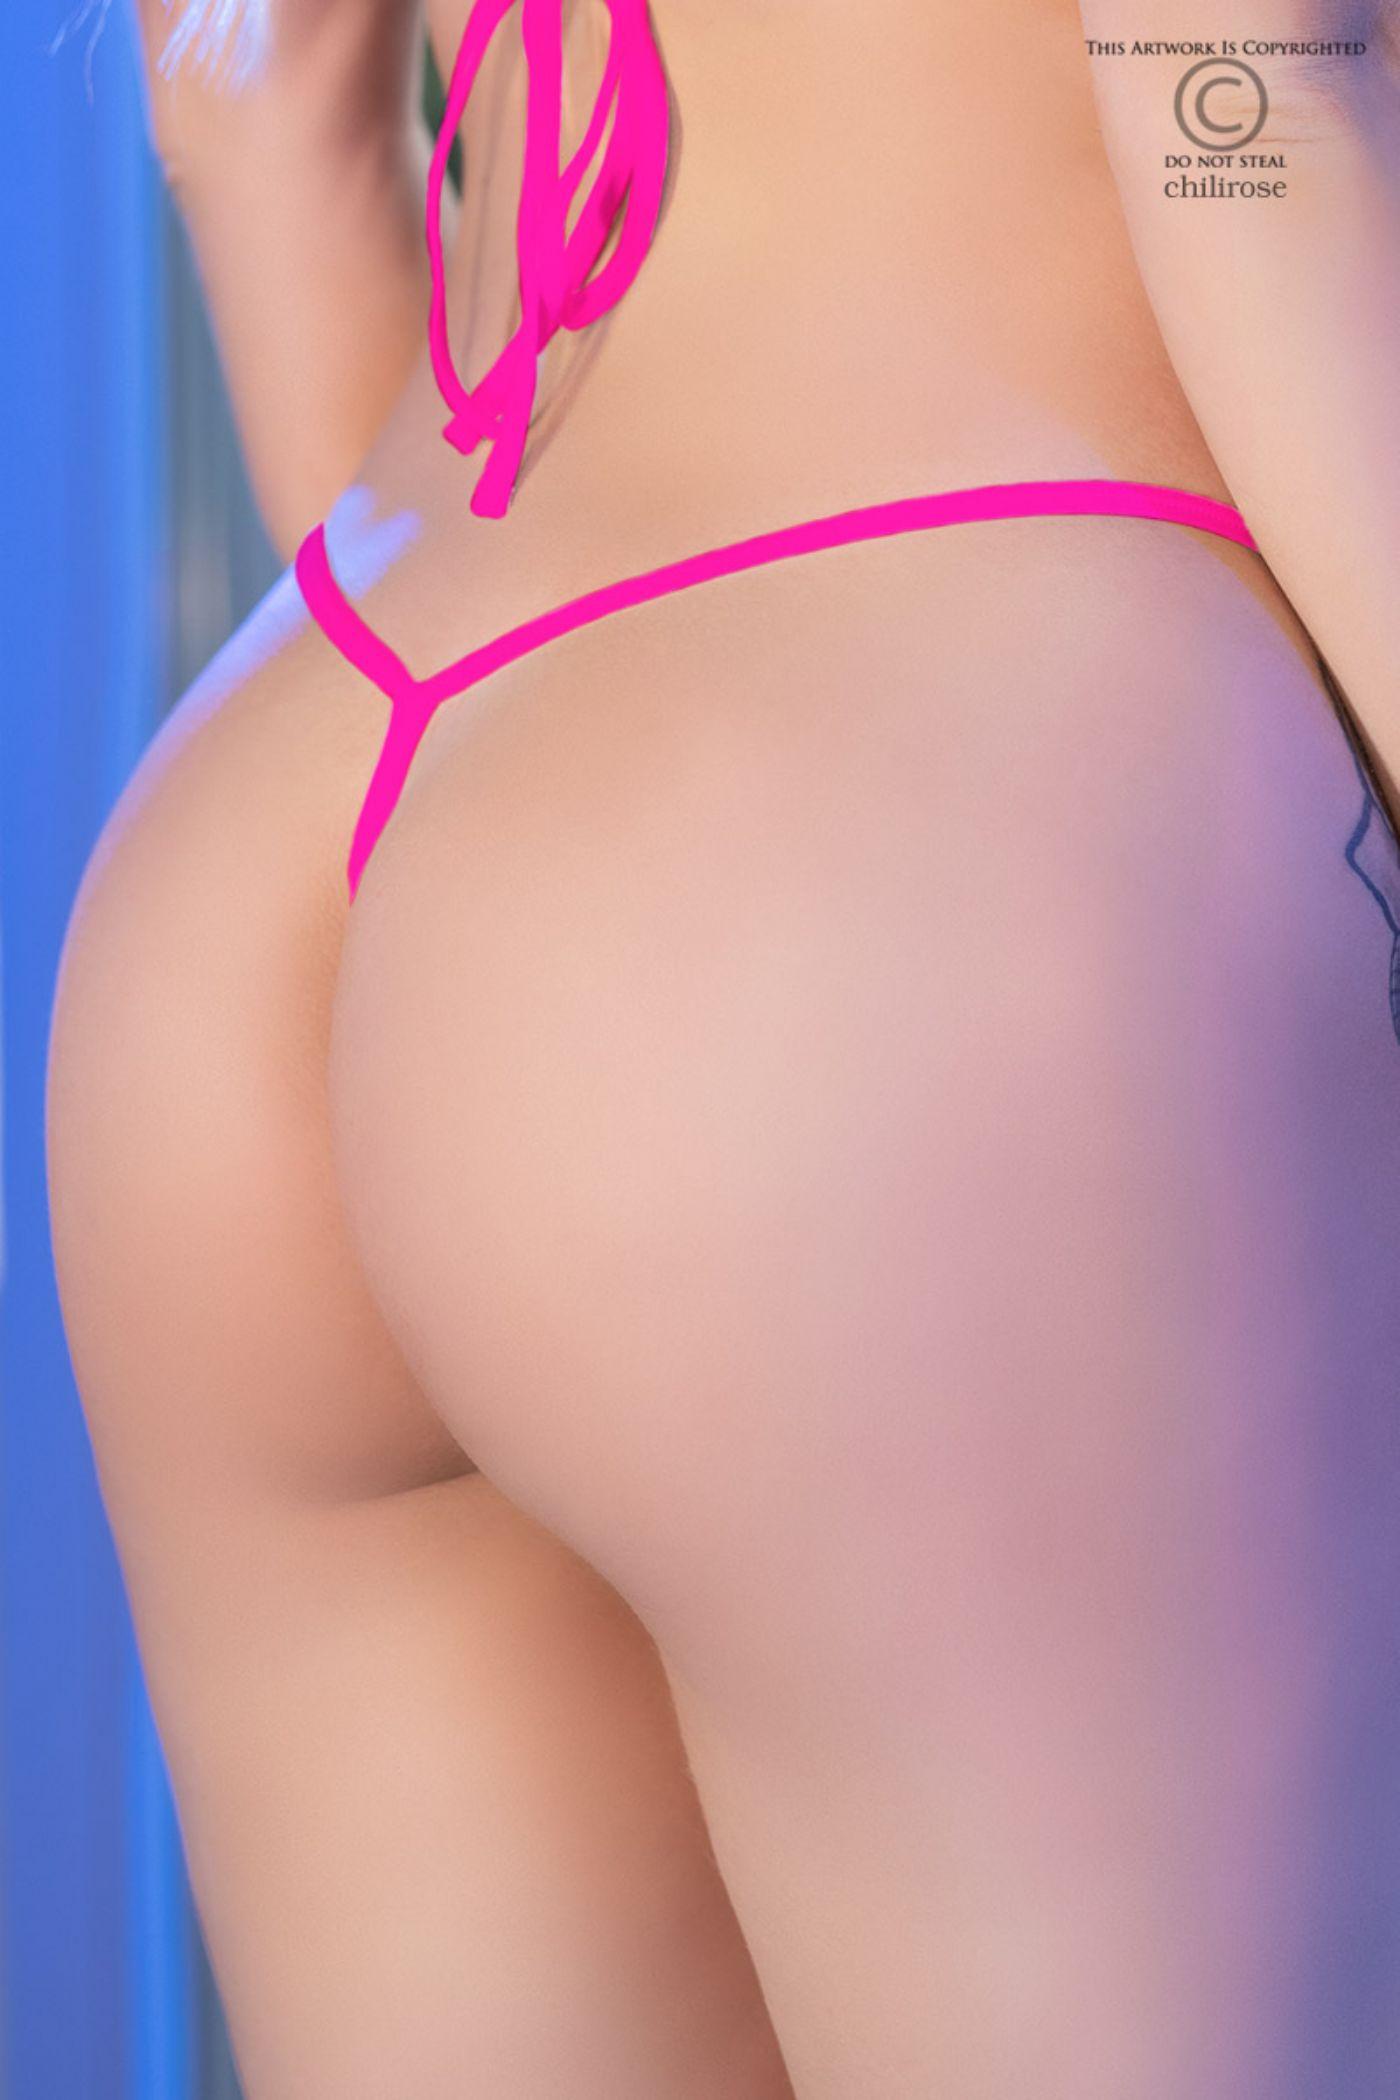 Mini Thong Y-bag - Hot pink (CR-4382)